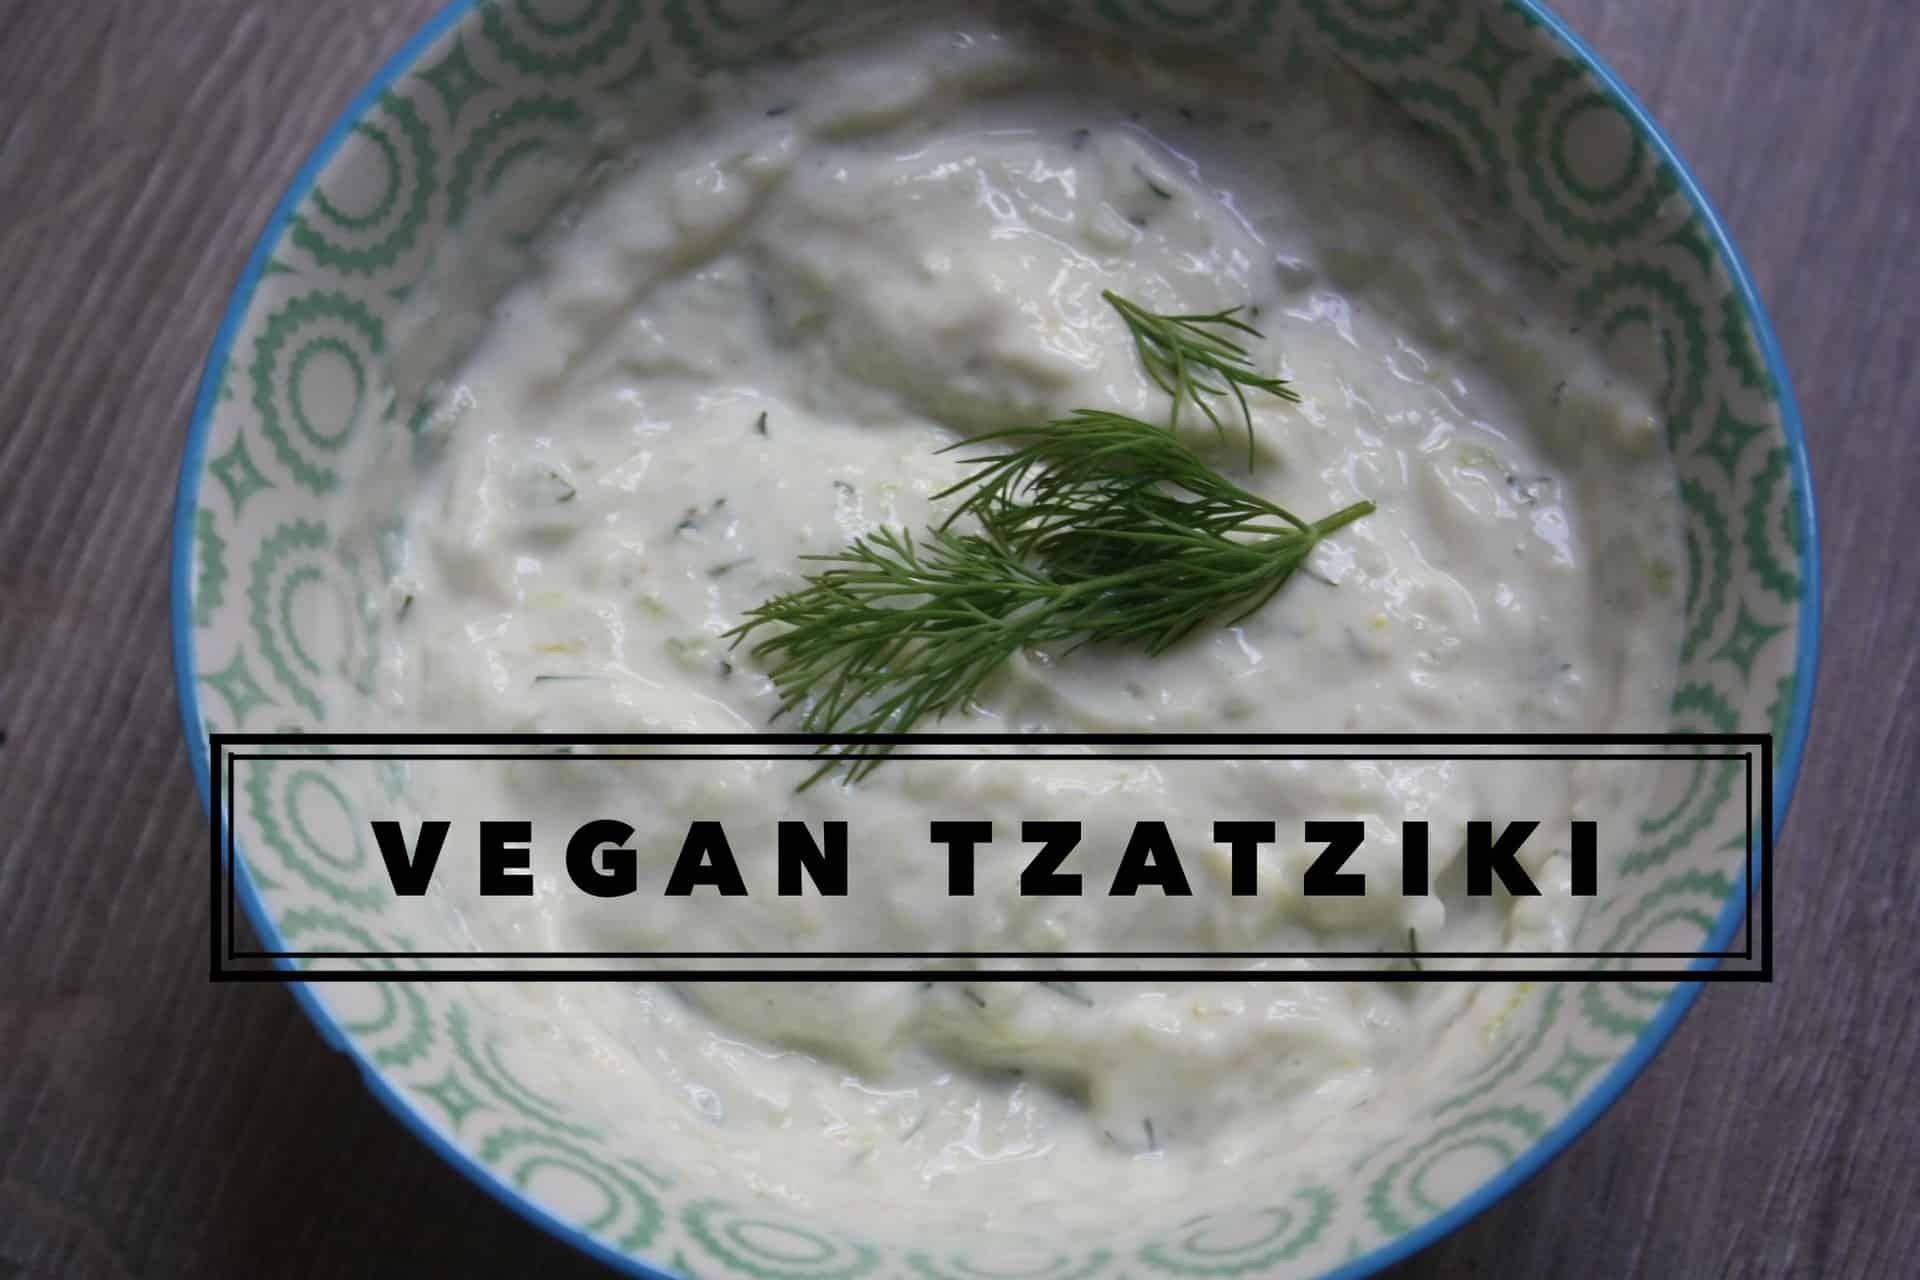 Vegan dairy-free tzatziki